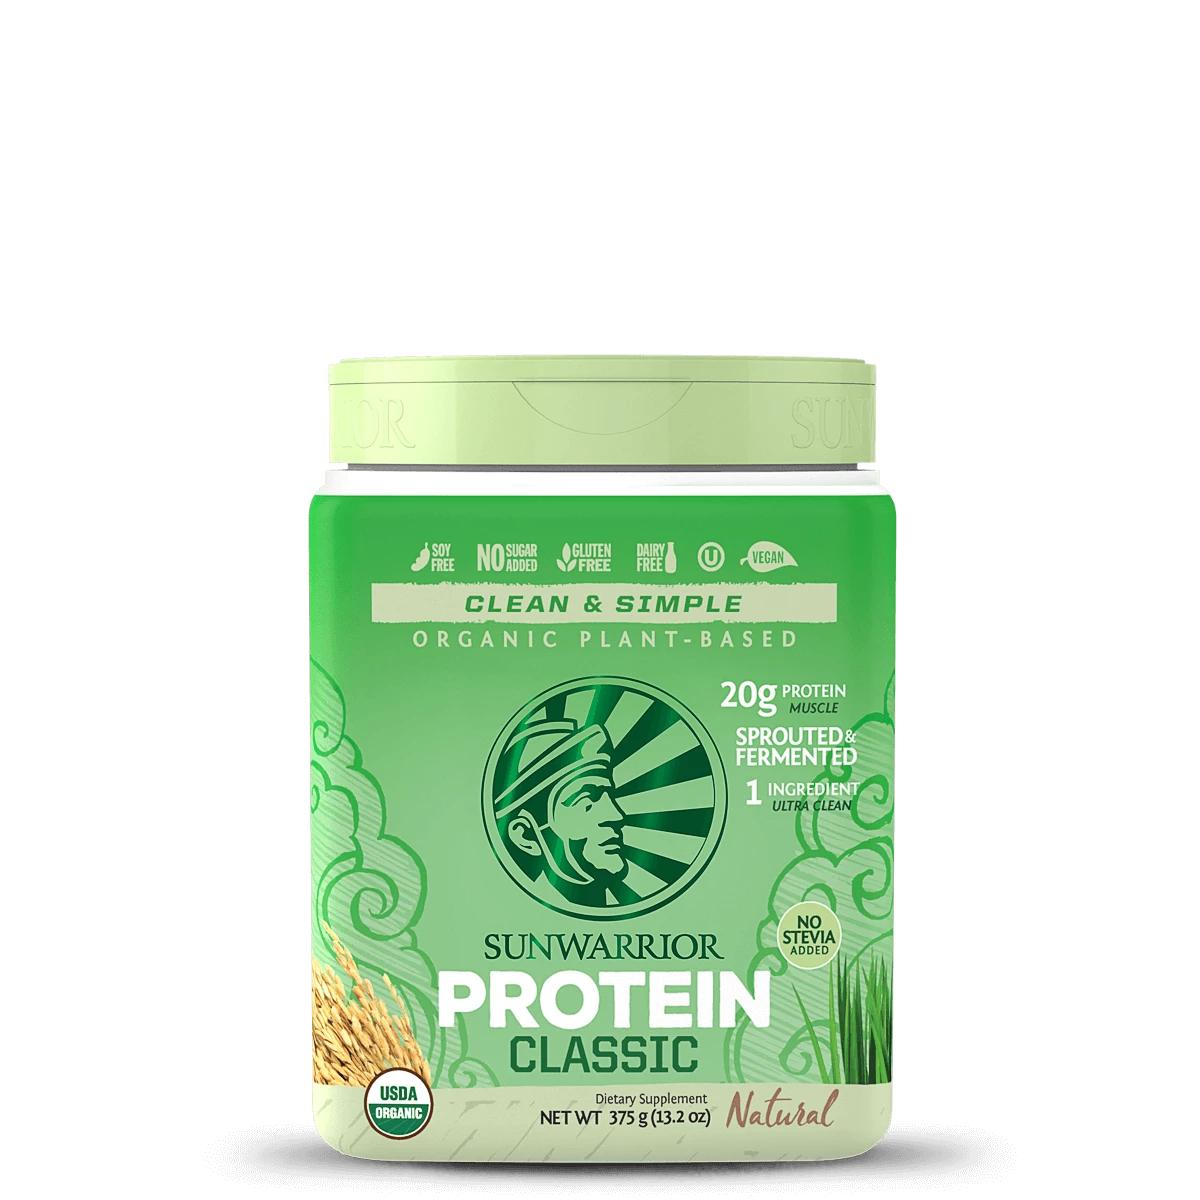 Sunwarrior Classic Protein 375g 814784025896(base)